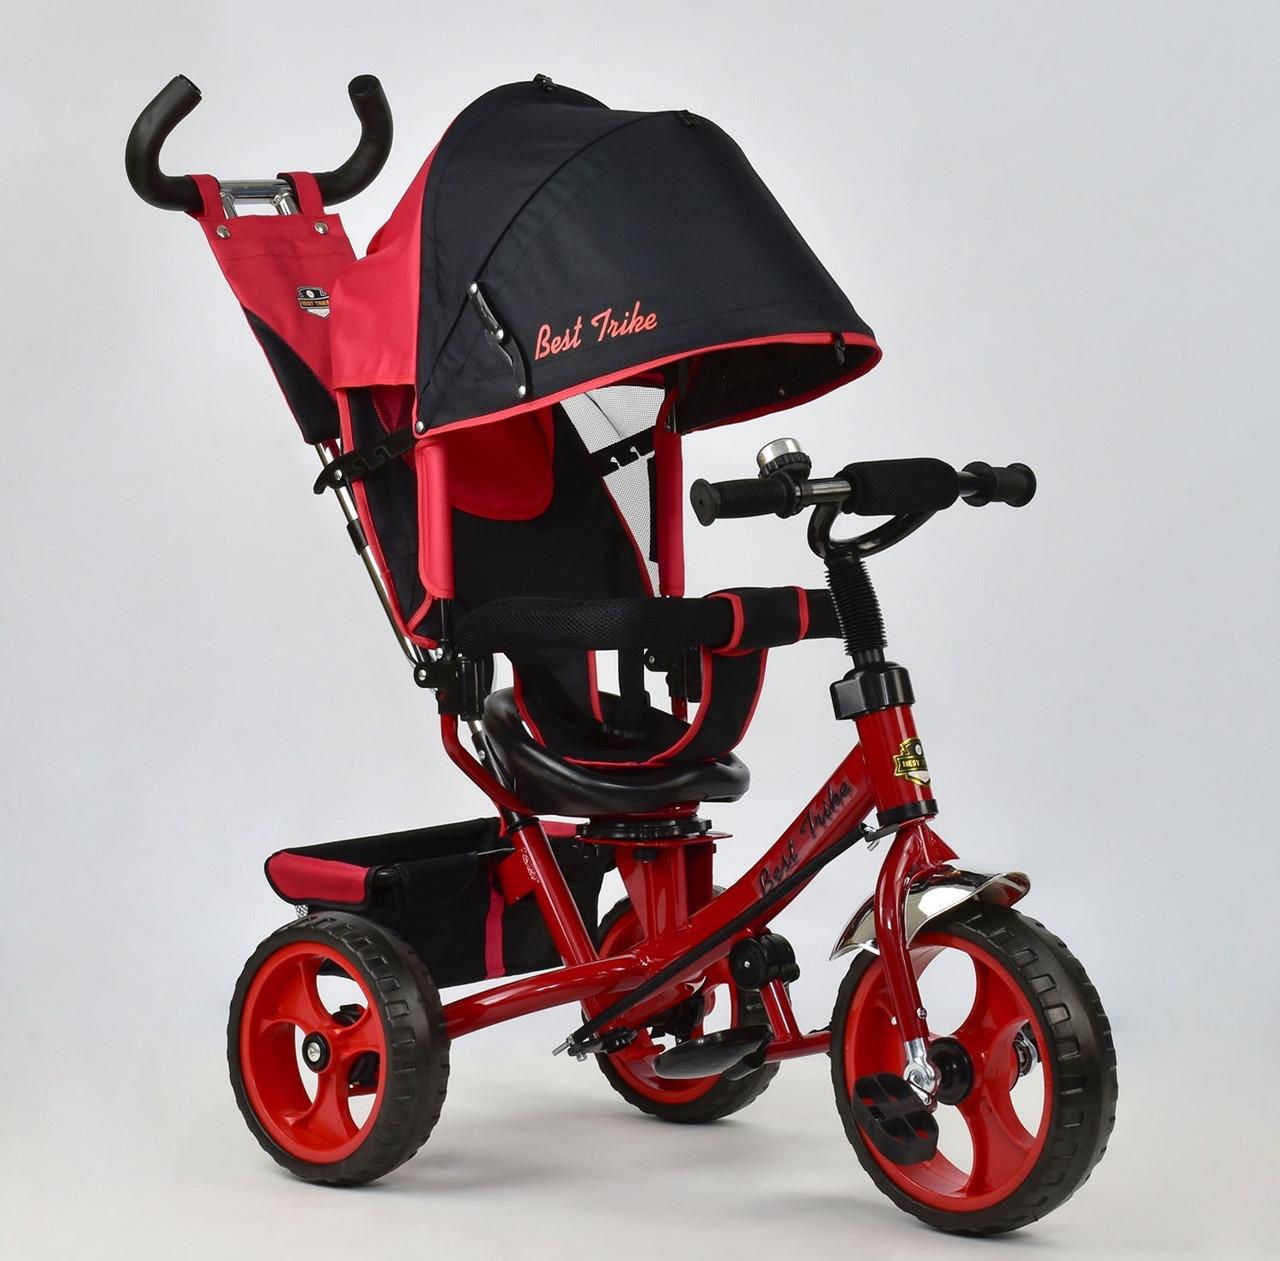 Best Trike Велосипед Best Trike 5700 4670 Red (5700)